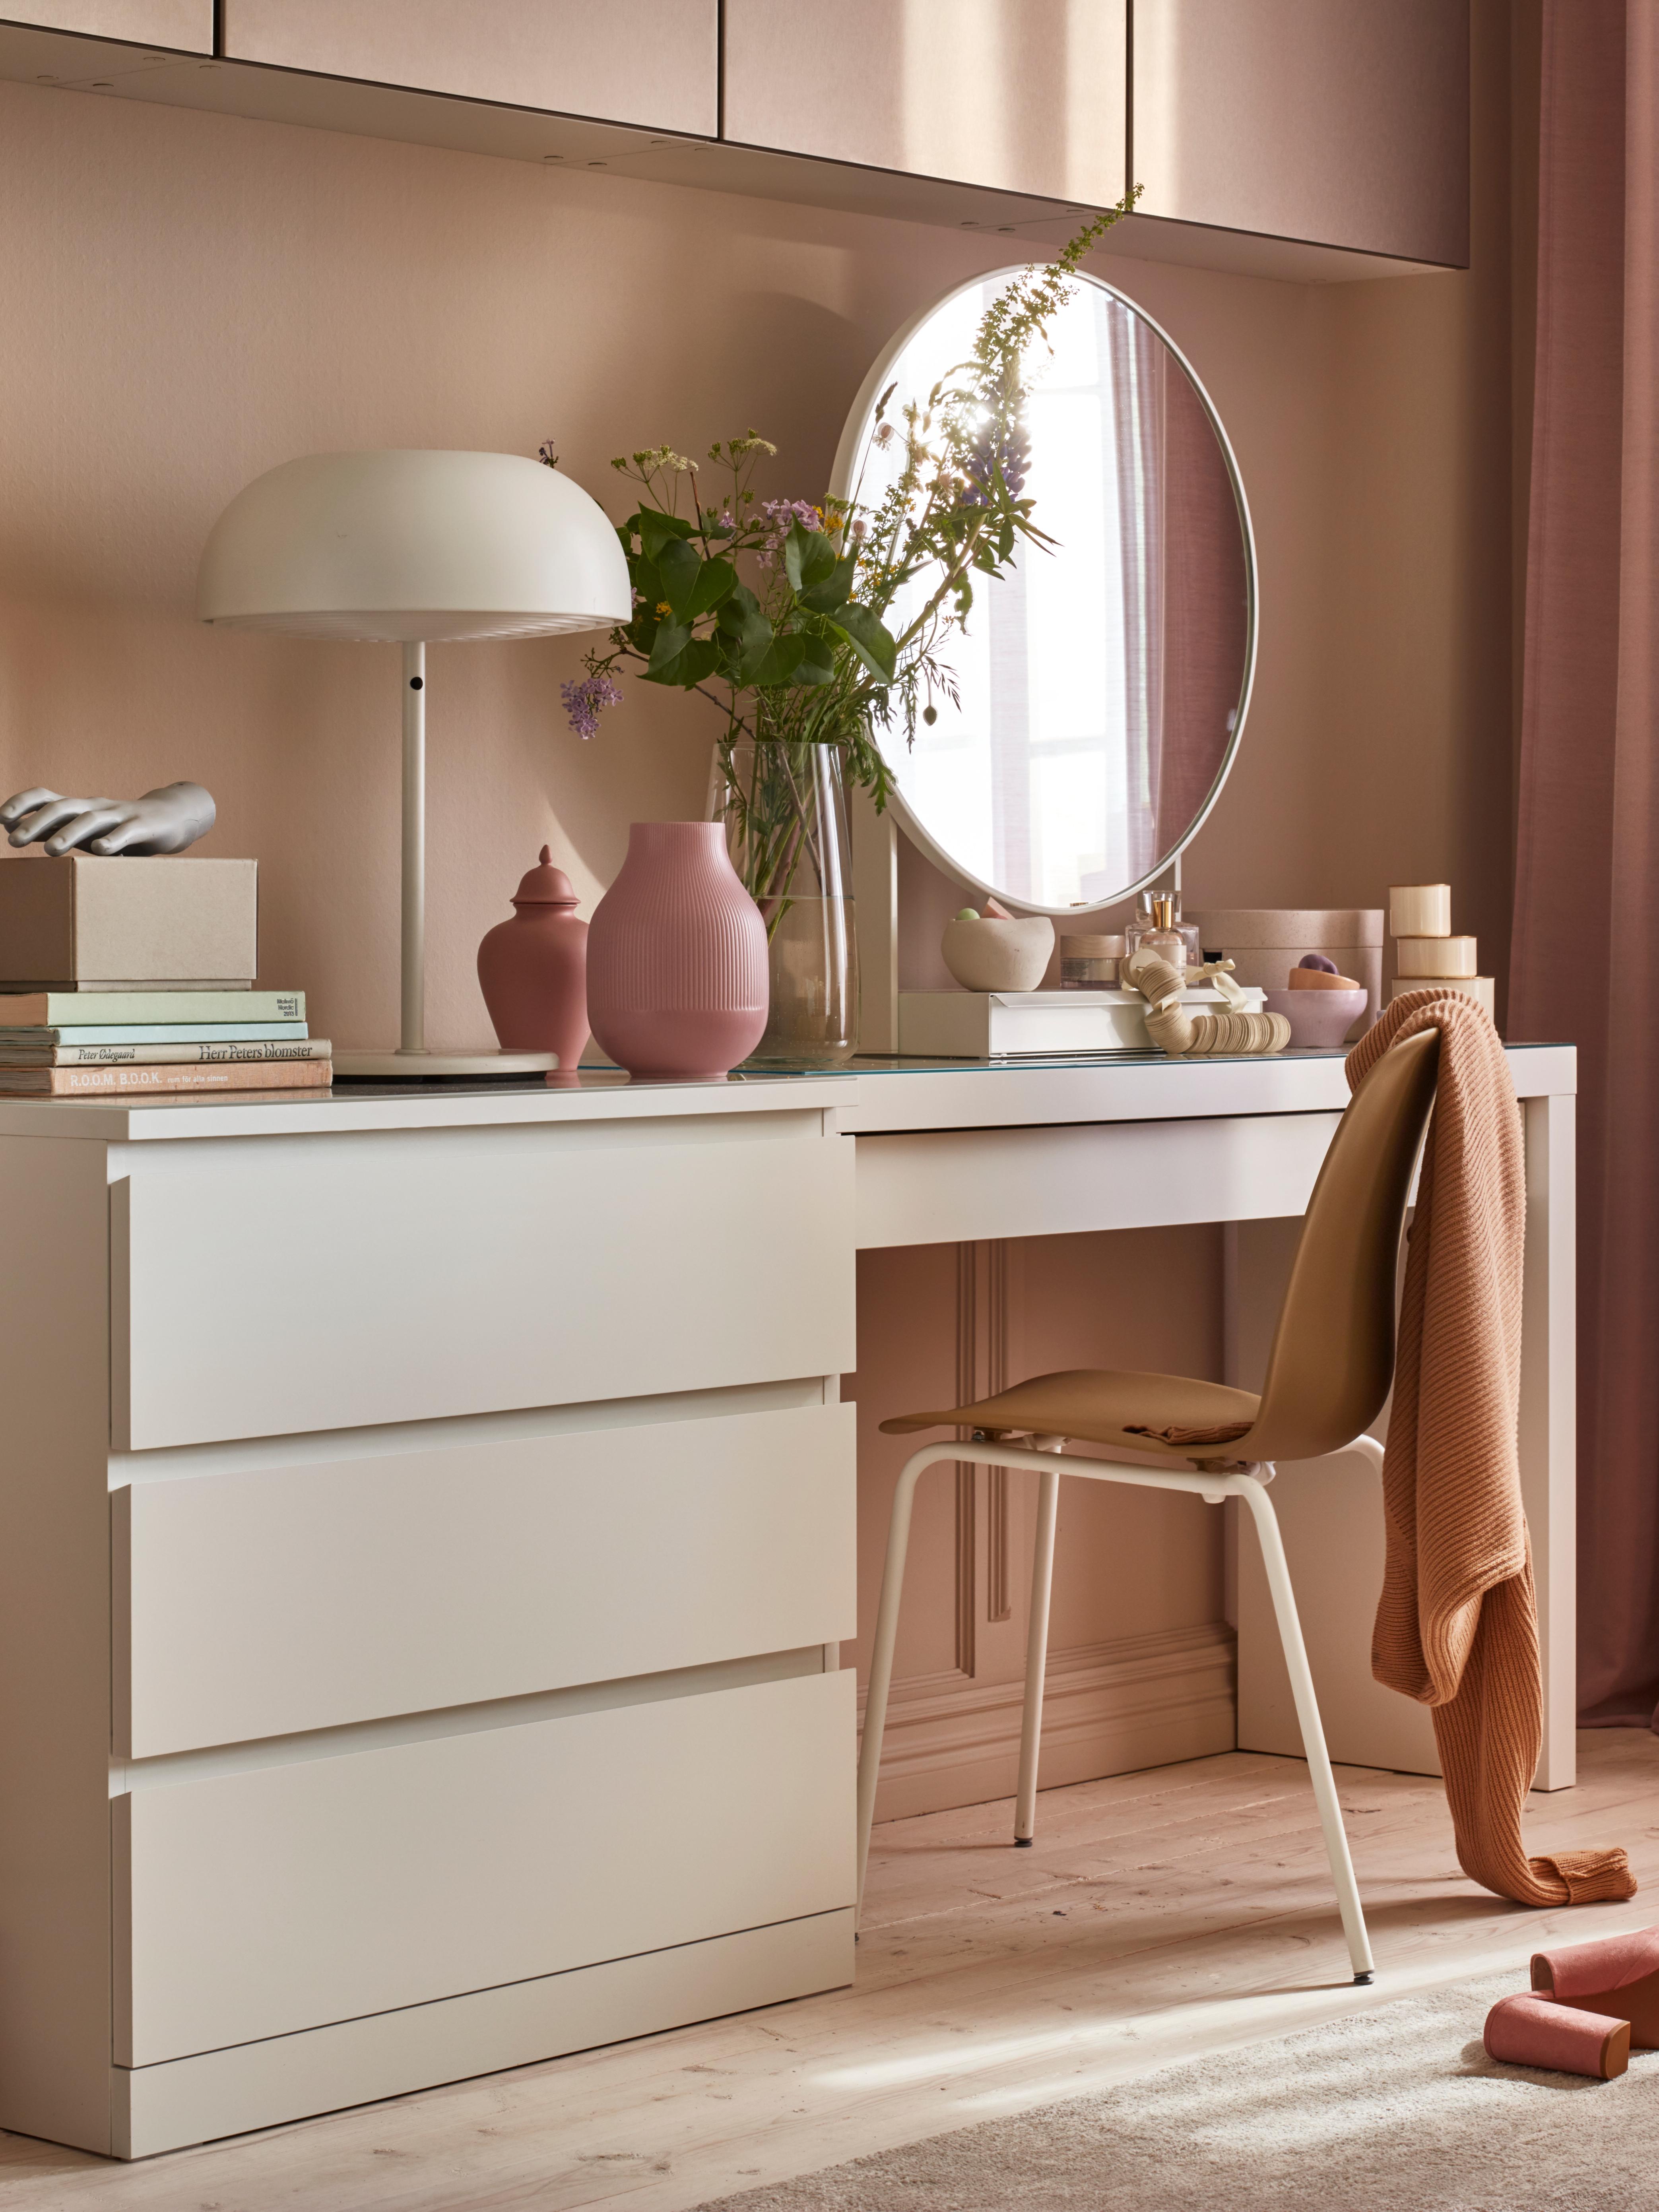 Bela MALM komoda s tri fioke pored toaletnog stola iste visine na kom se nalaze lampa, vaze i ogledalo.